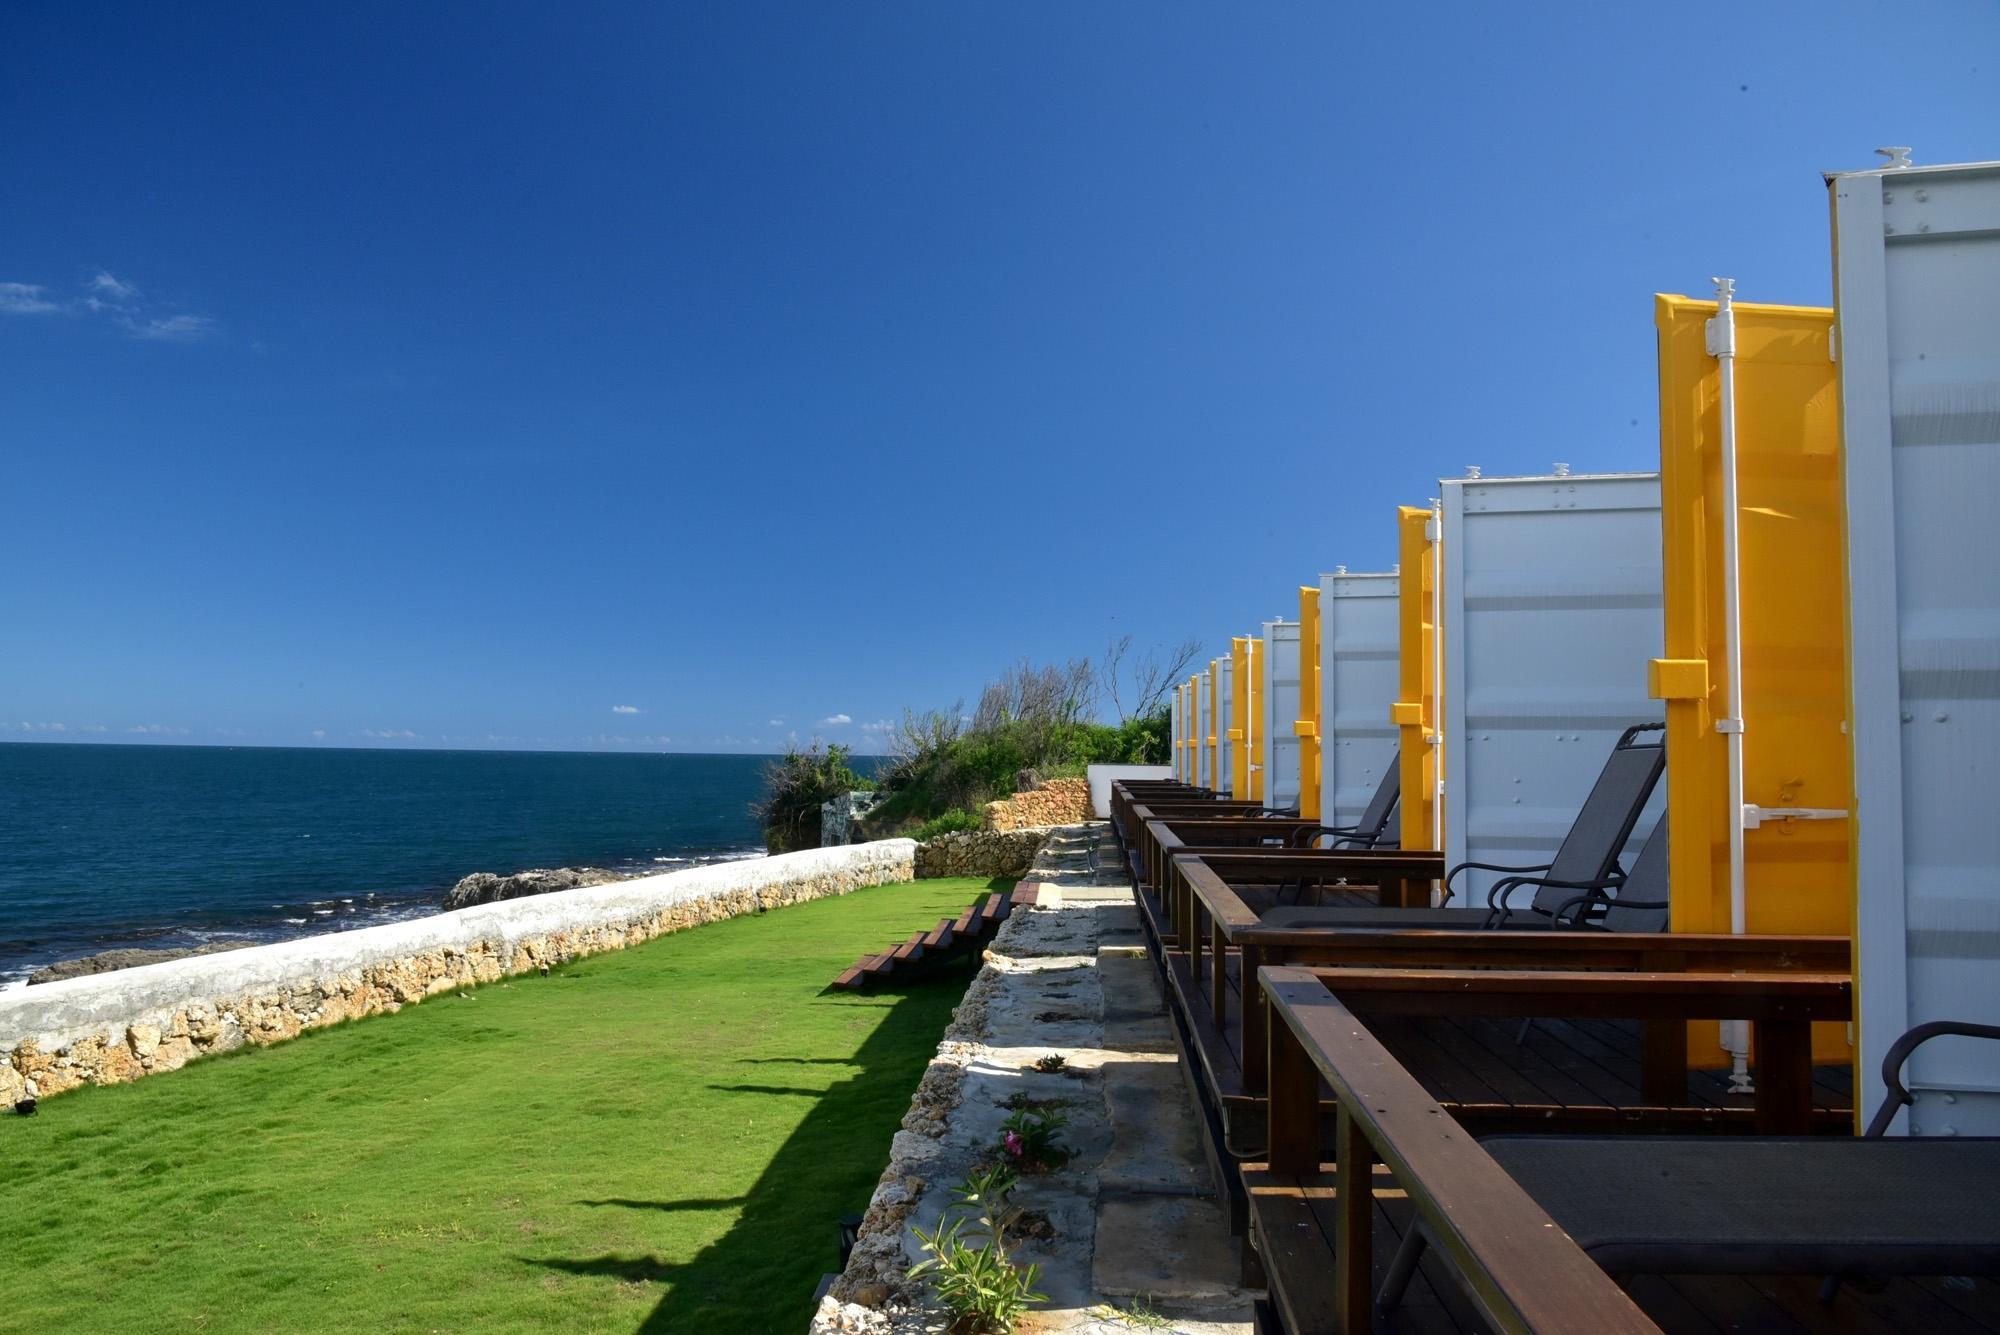 Liuqiu 1302 Seascape Resorts